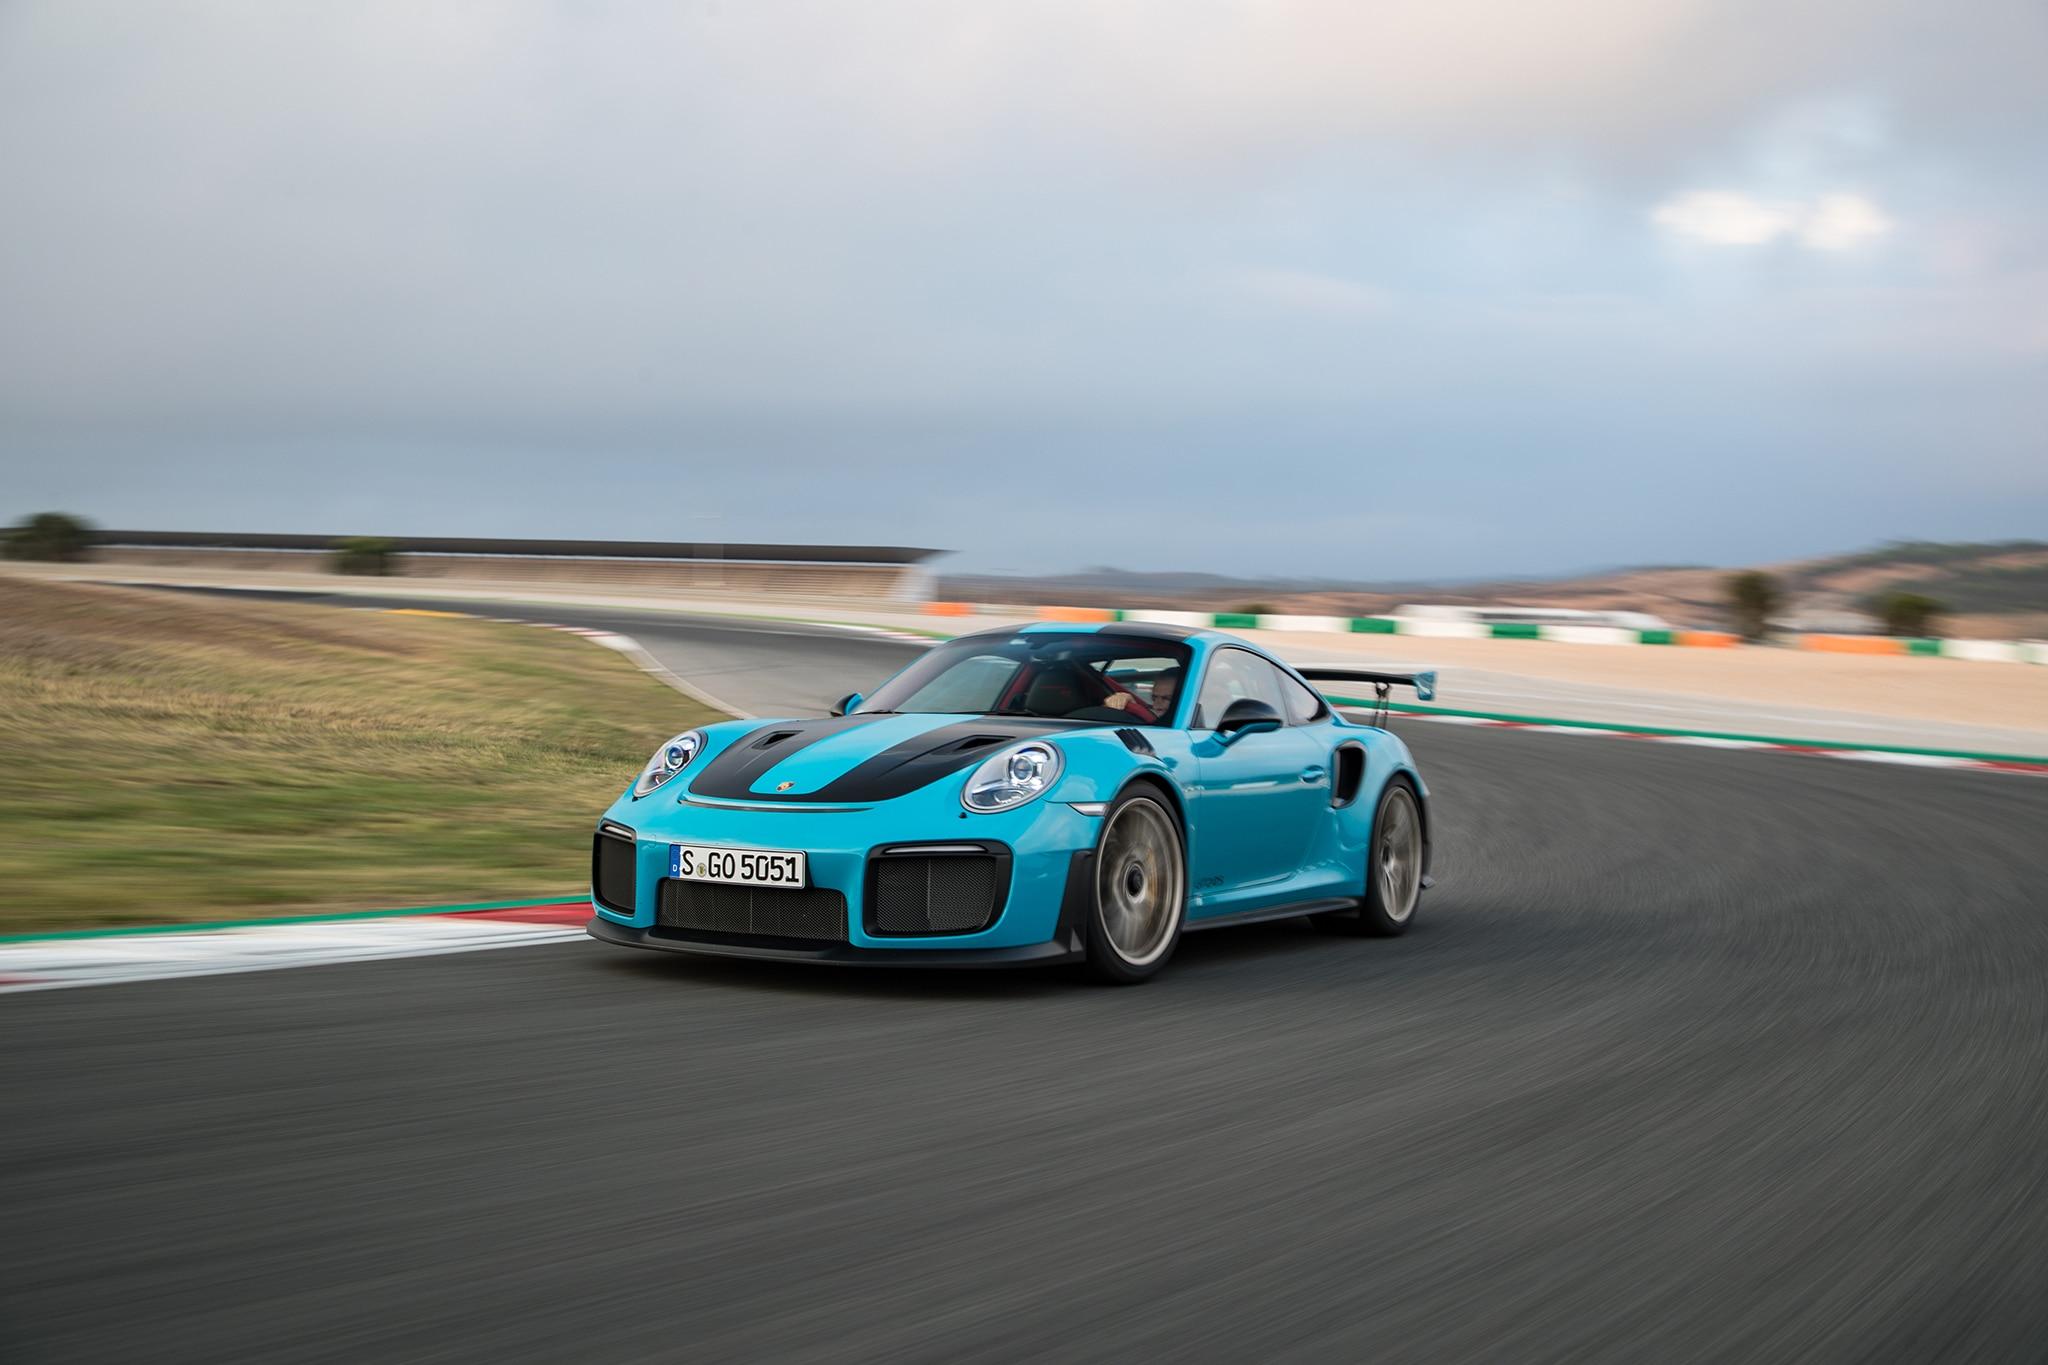 2018-Porsche-911-GT2-RS-front-three-quarter-in-motion-36 Interesting Porsche 911 Gt2 Rs Nurburgring Lap Cars Trend